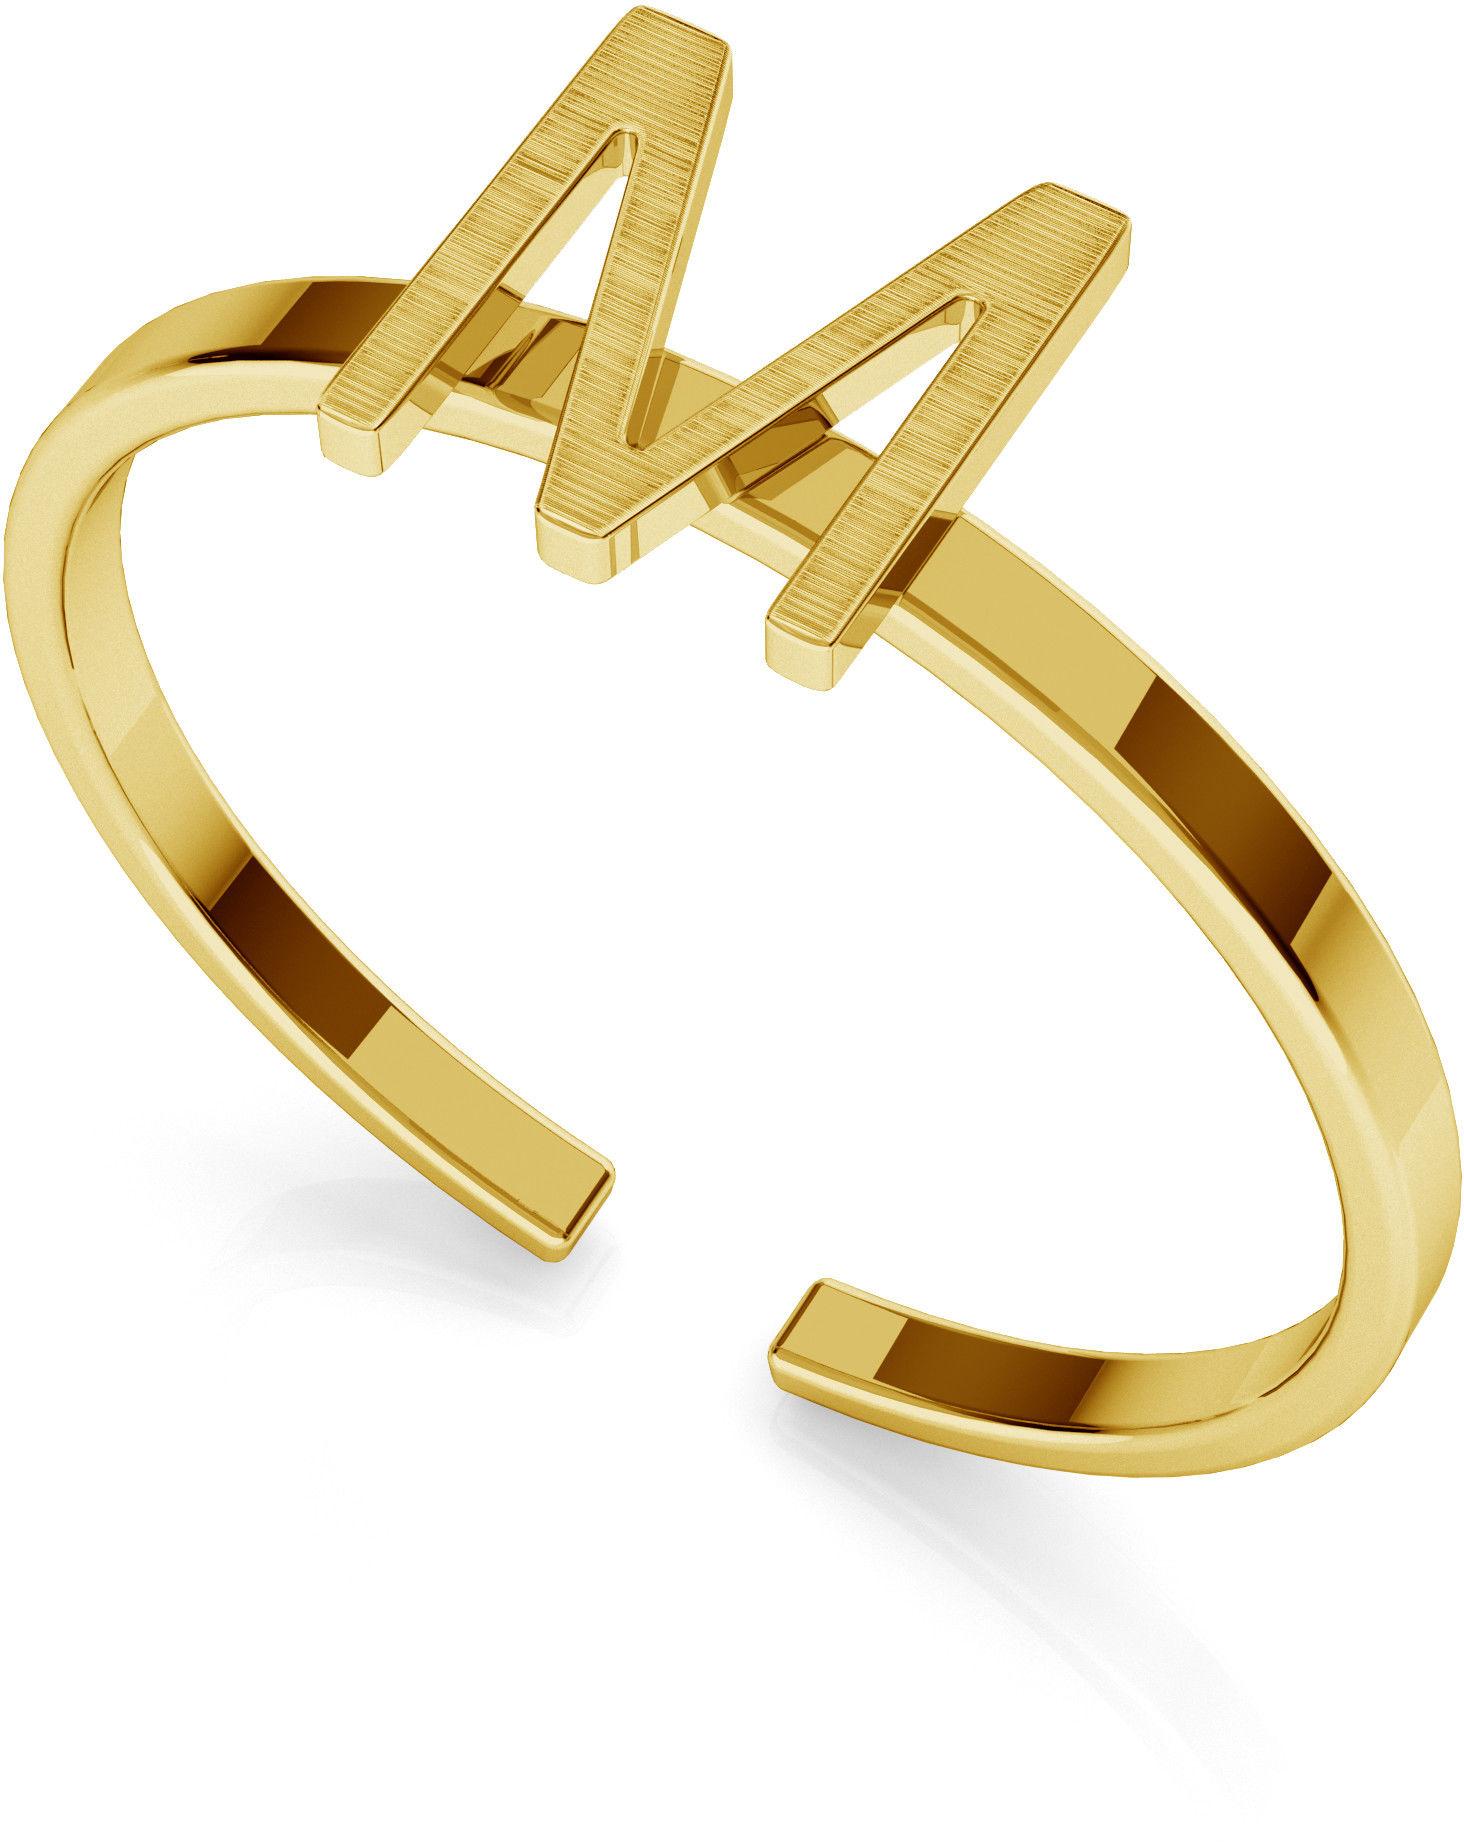 Srebrny pierścionek z literką My RING, srebro 925 : Litera - I, Srebro - kolor pokrycia - Pokrycie platyną